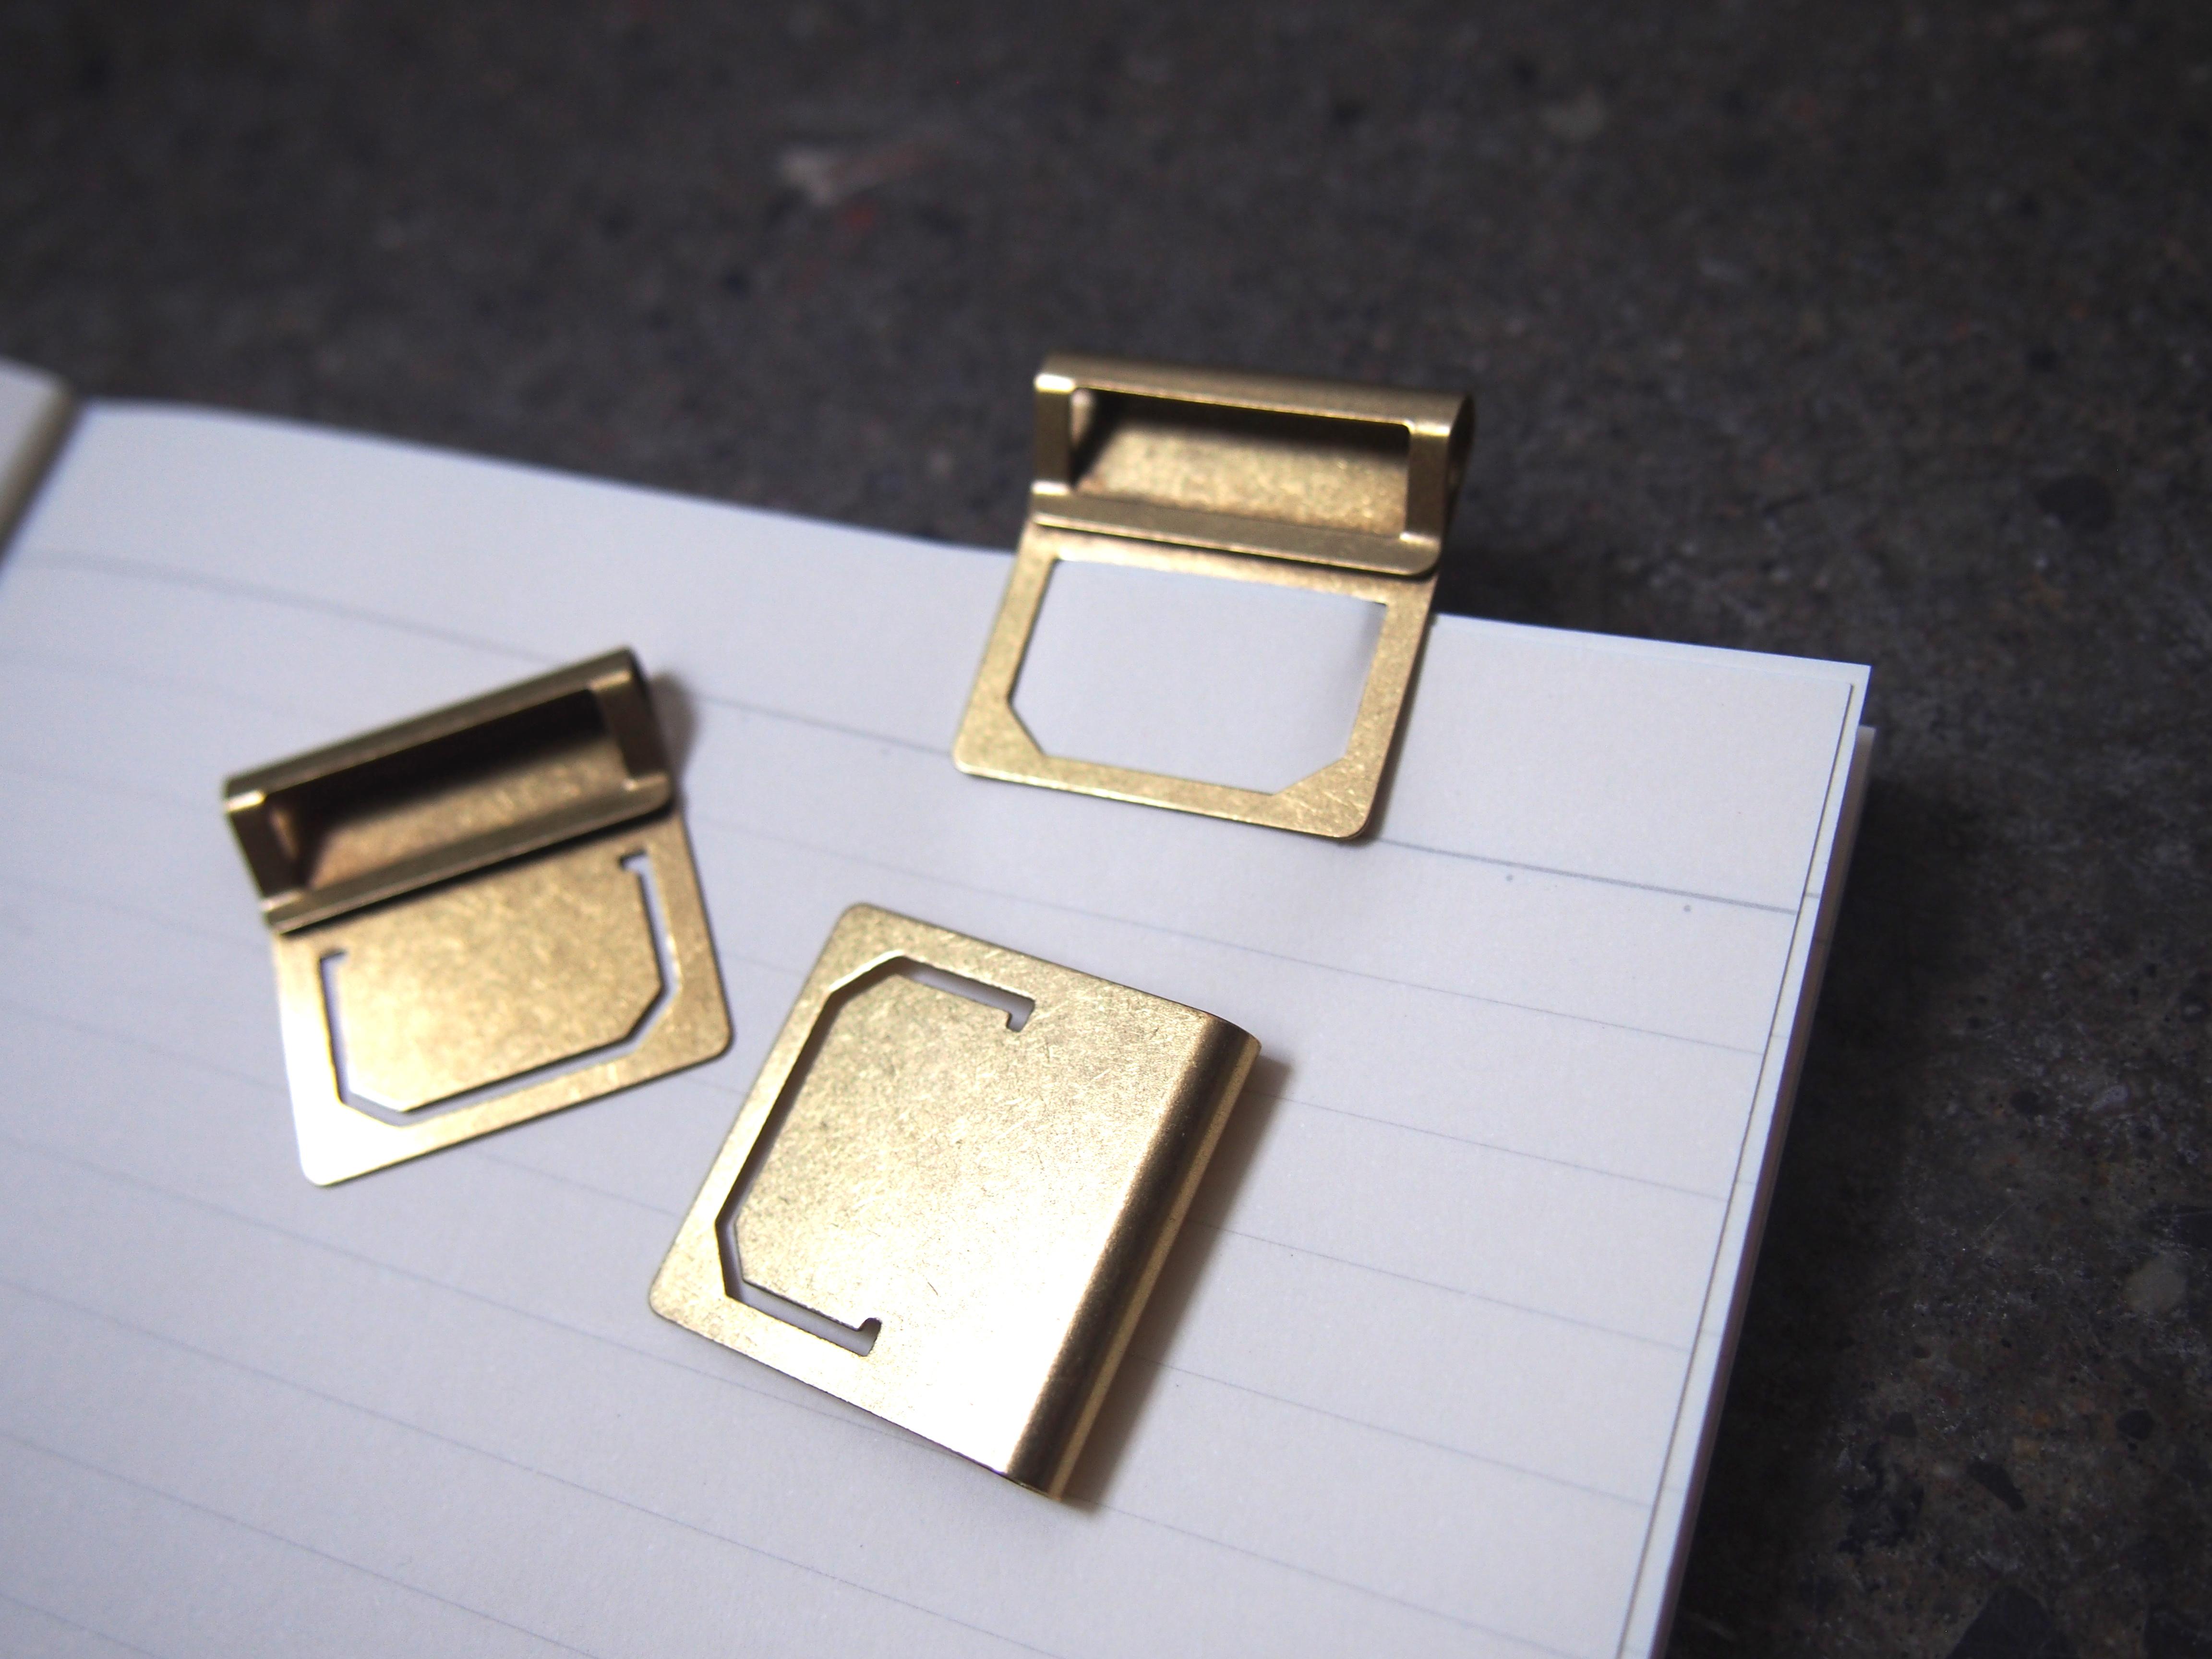 Midori Brass Index Clips Wonder Pens Blog wonderpens.ca Toronto Canada